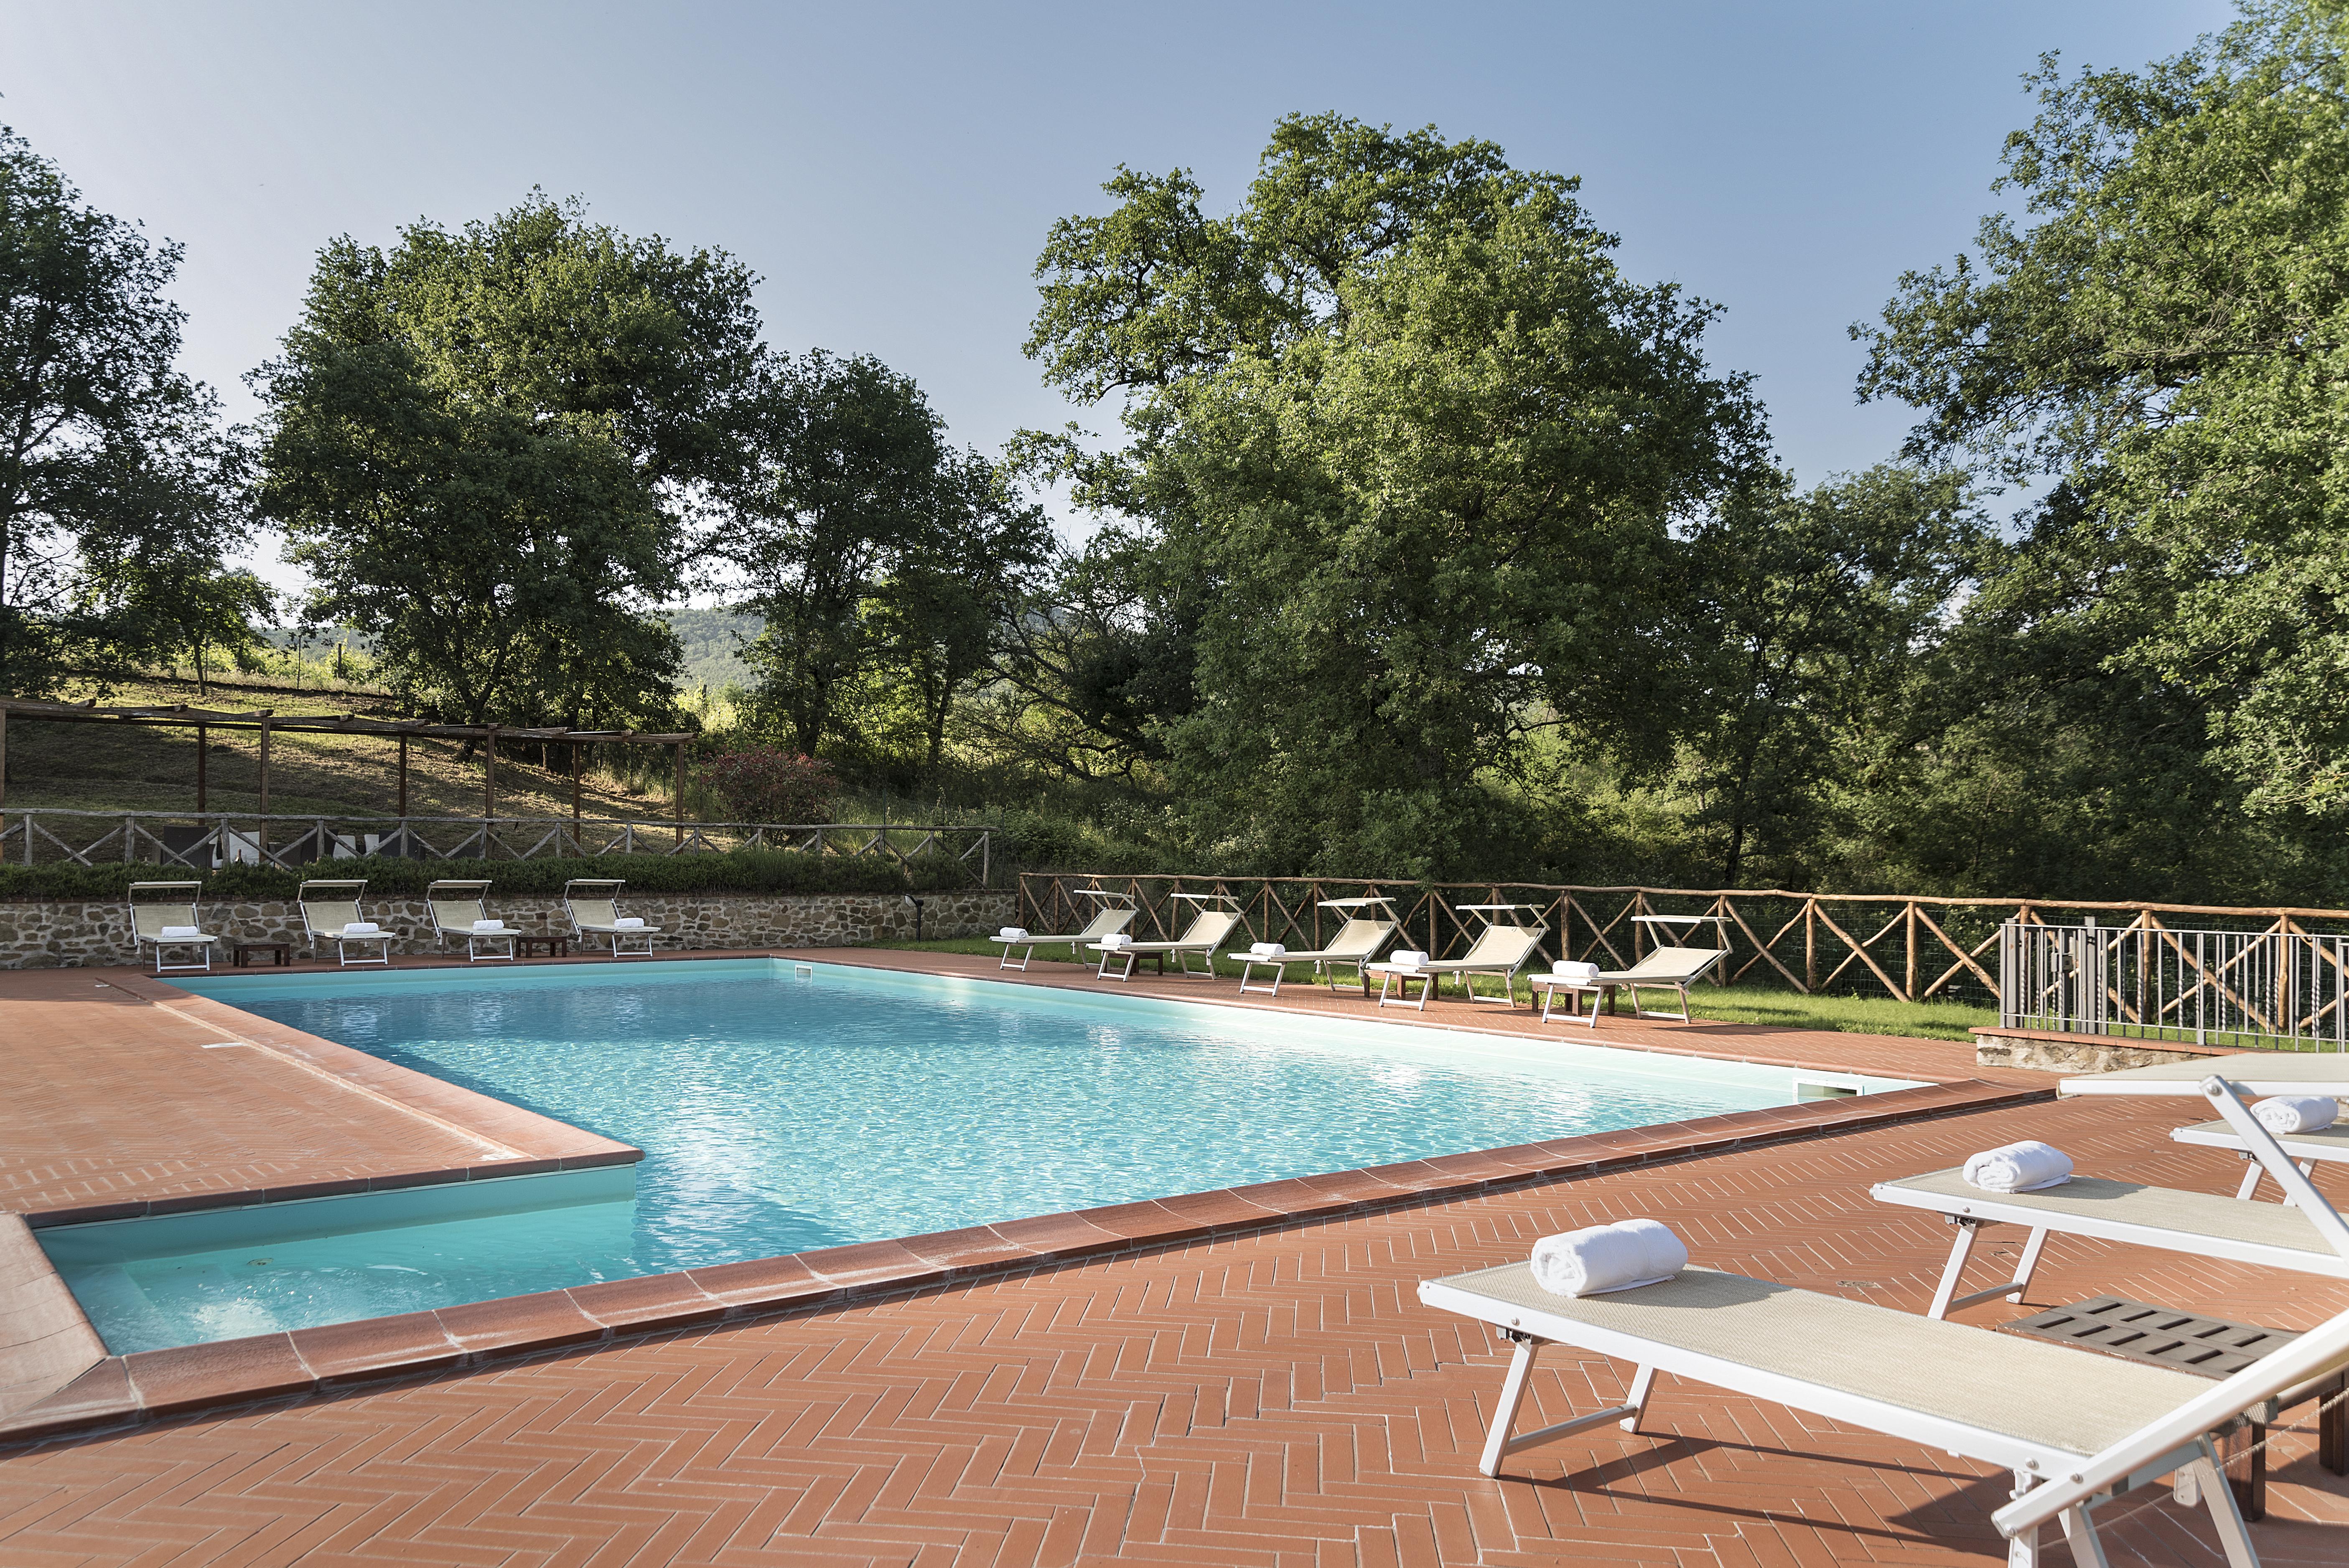 swimming-pool-agriturismo, incrociata, rules, piscina, agriturismo con piscina, farmhouse with swimming pool